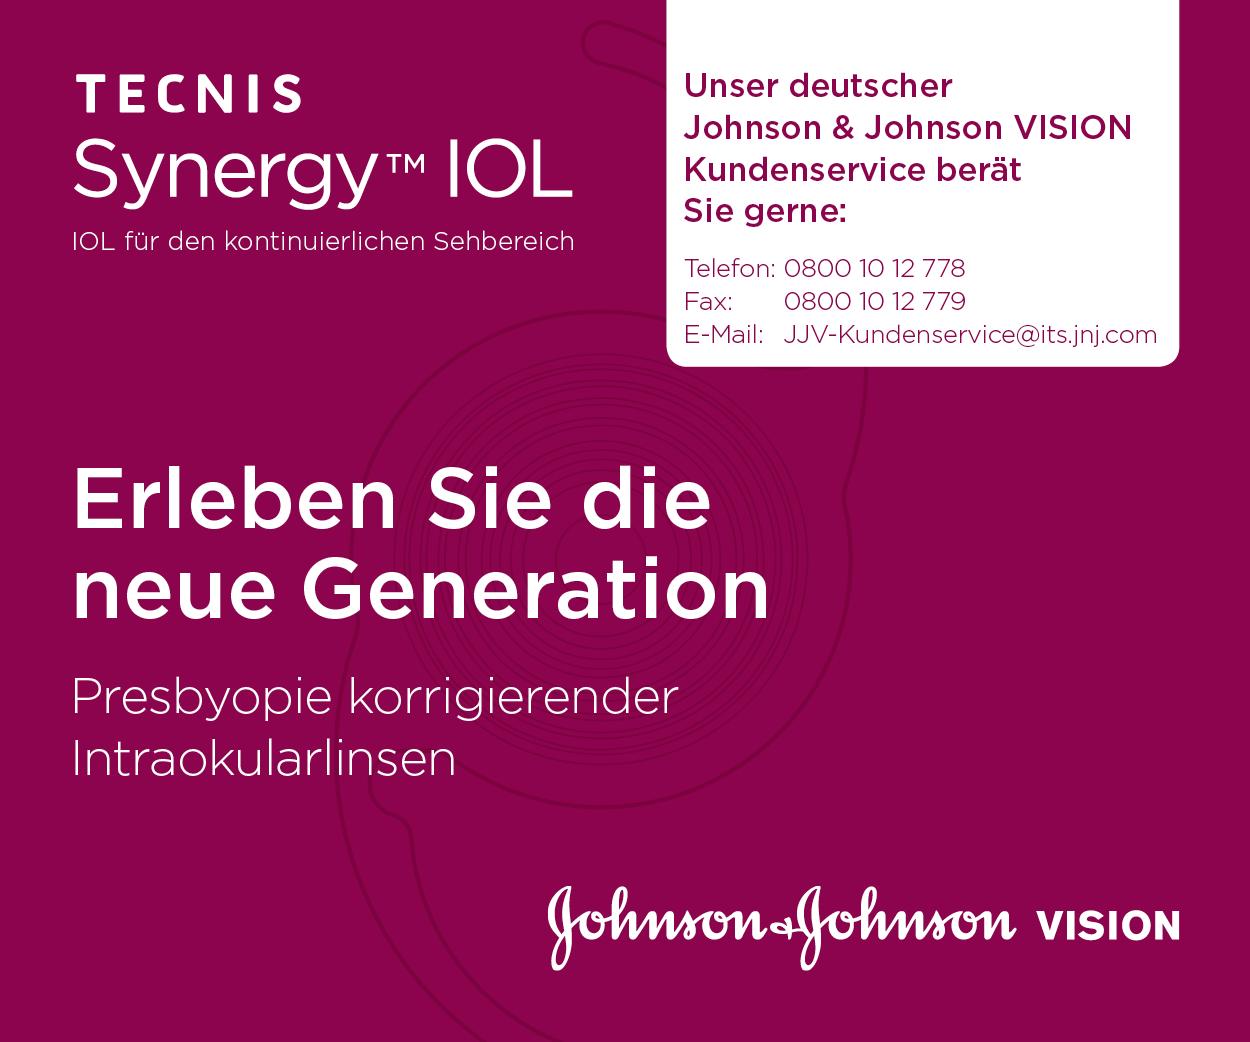 Johnson & Johnson Vision TECNIS Synergy™ IOL